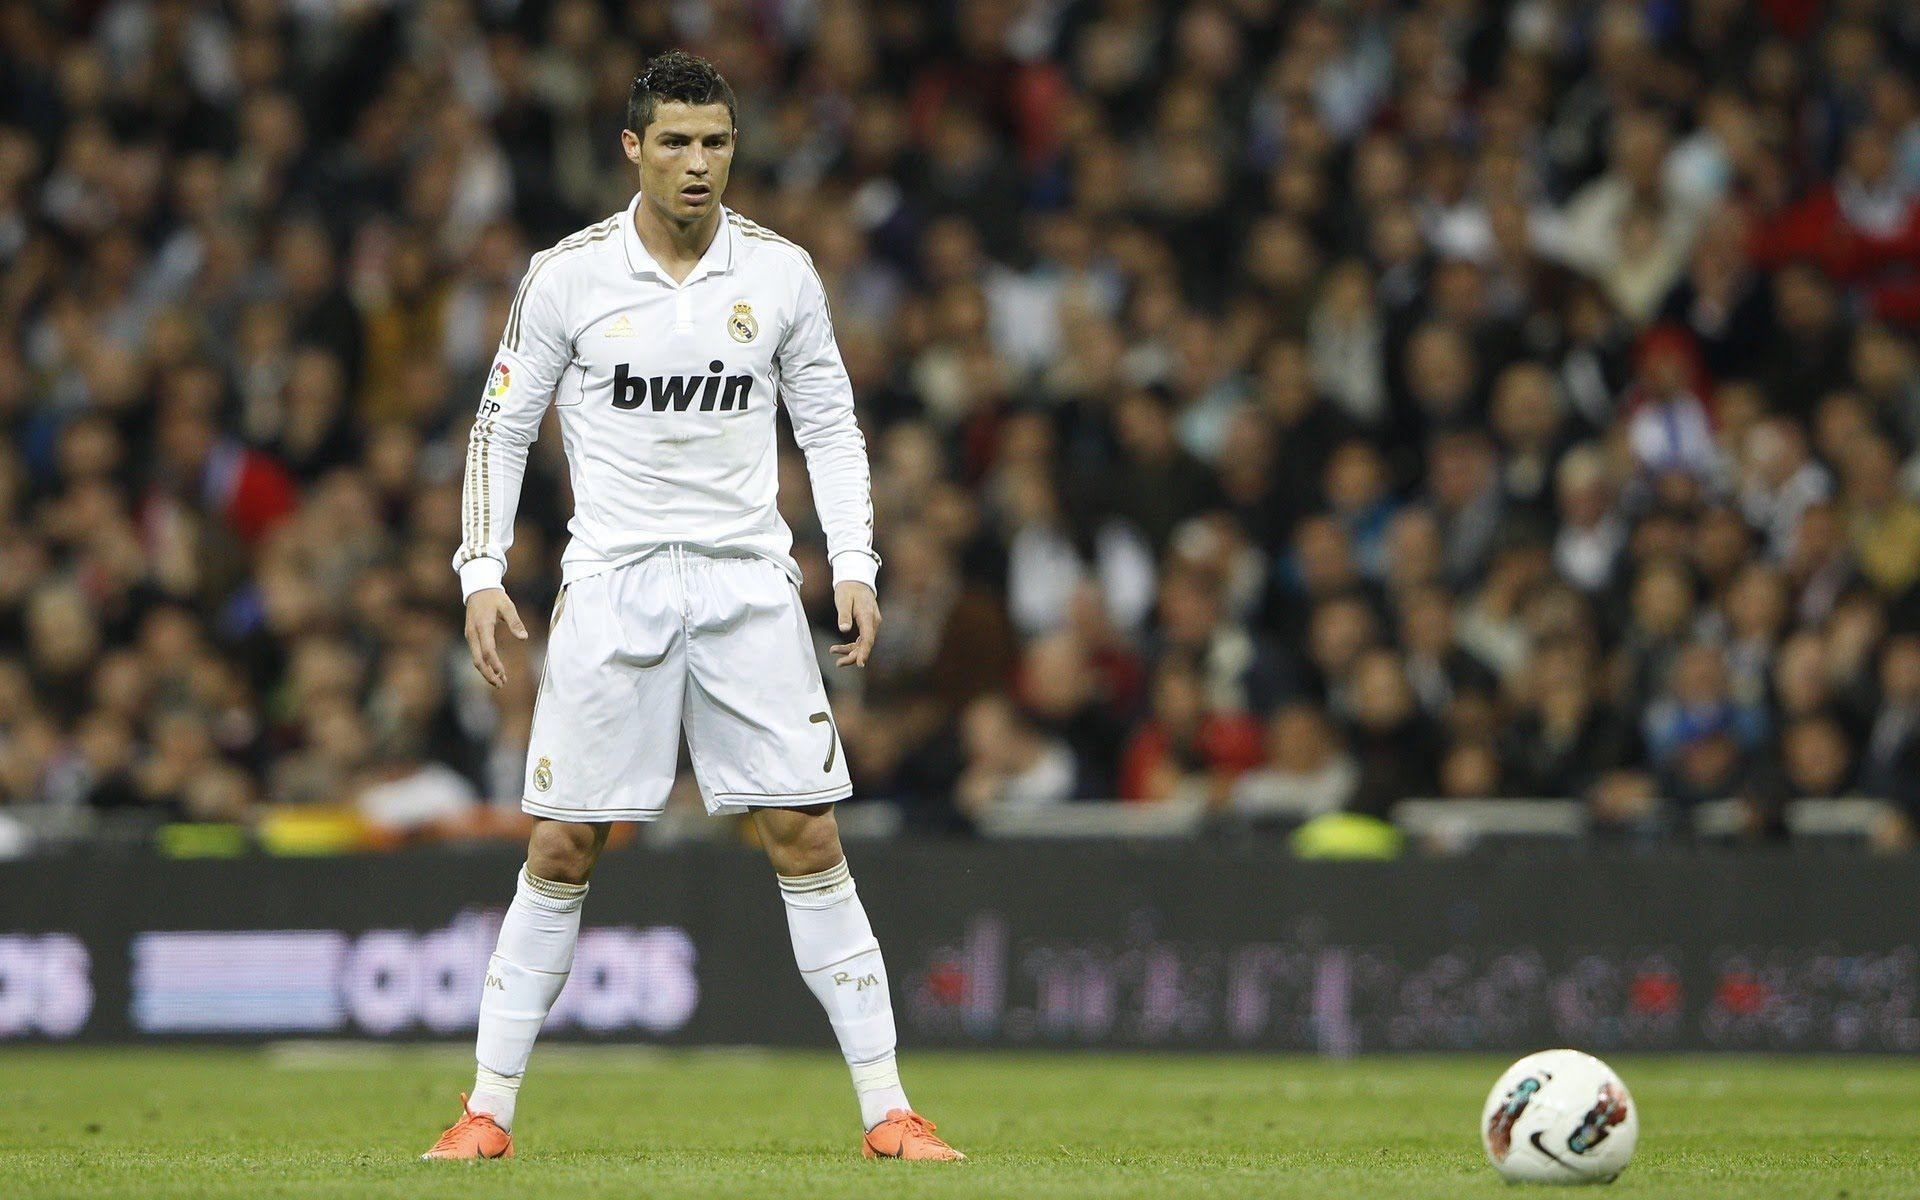 Ronaldo Free Kick Wallpaper Phone Bf7 Ronaldo Free Kick Cristiano Ronaldo Free Kick Ronaldo Soccer